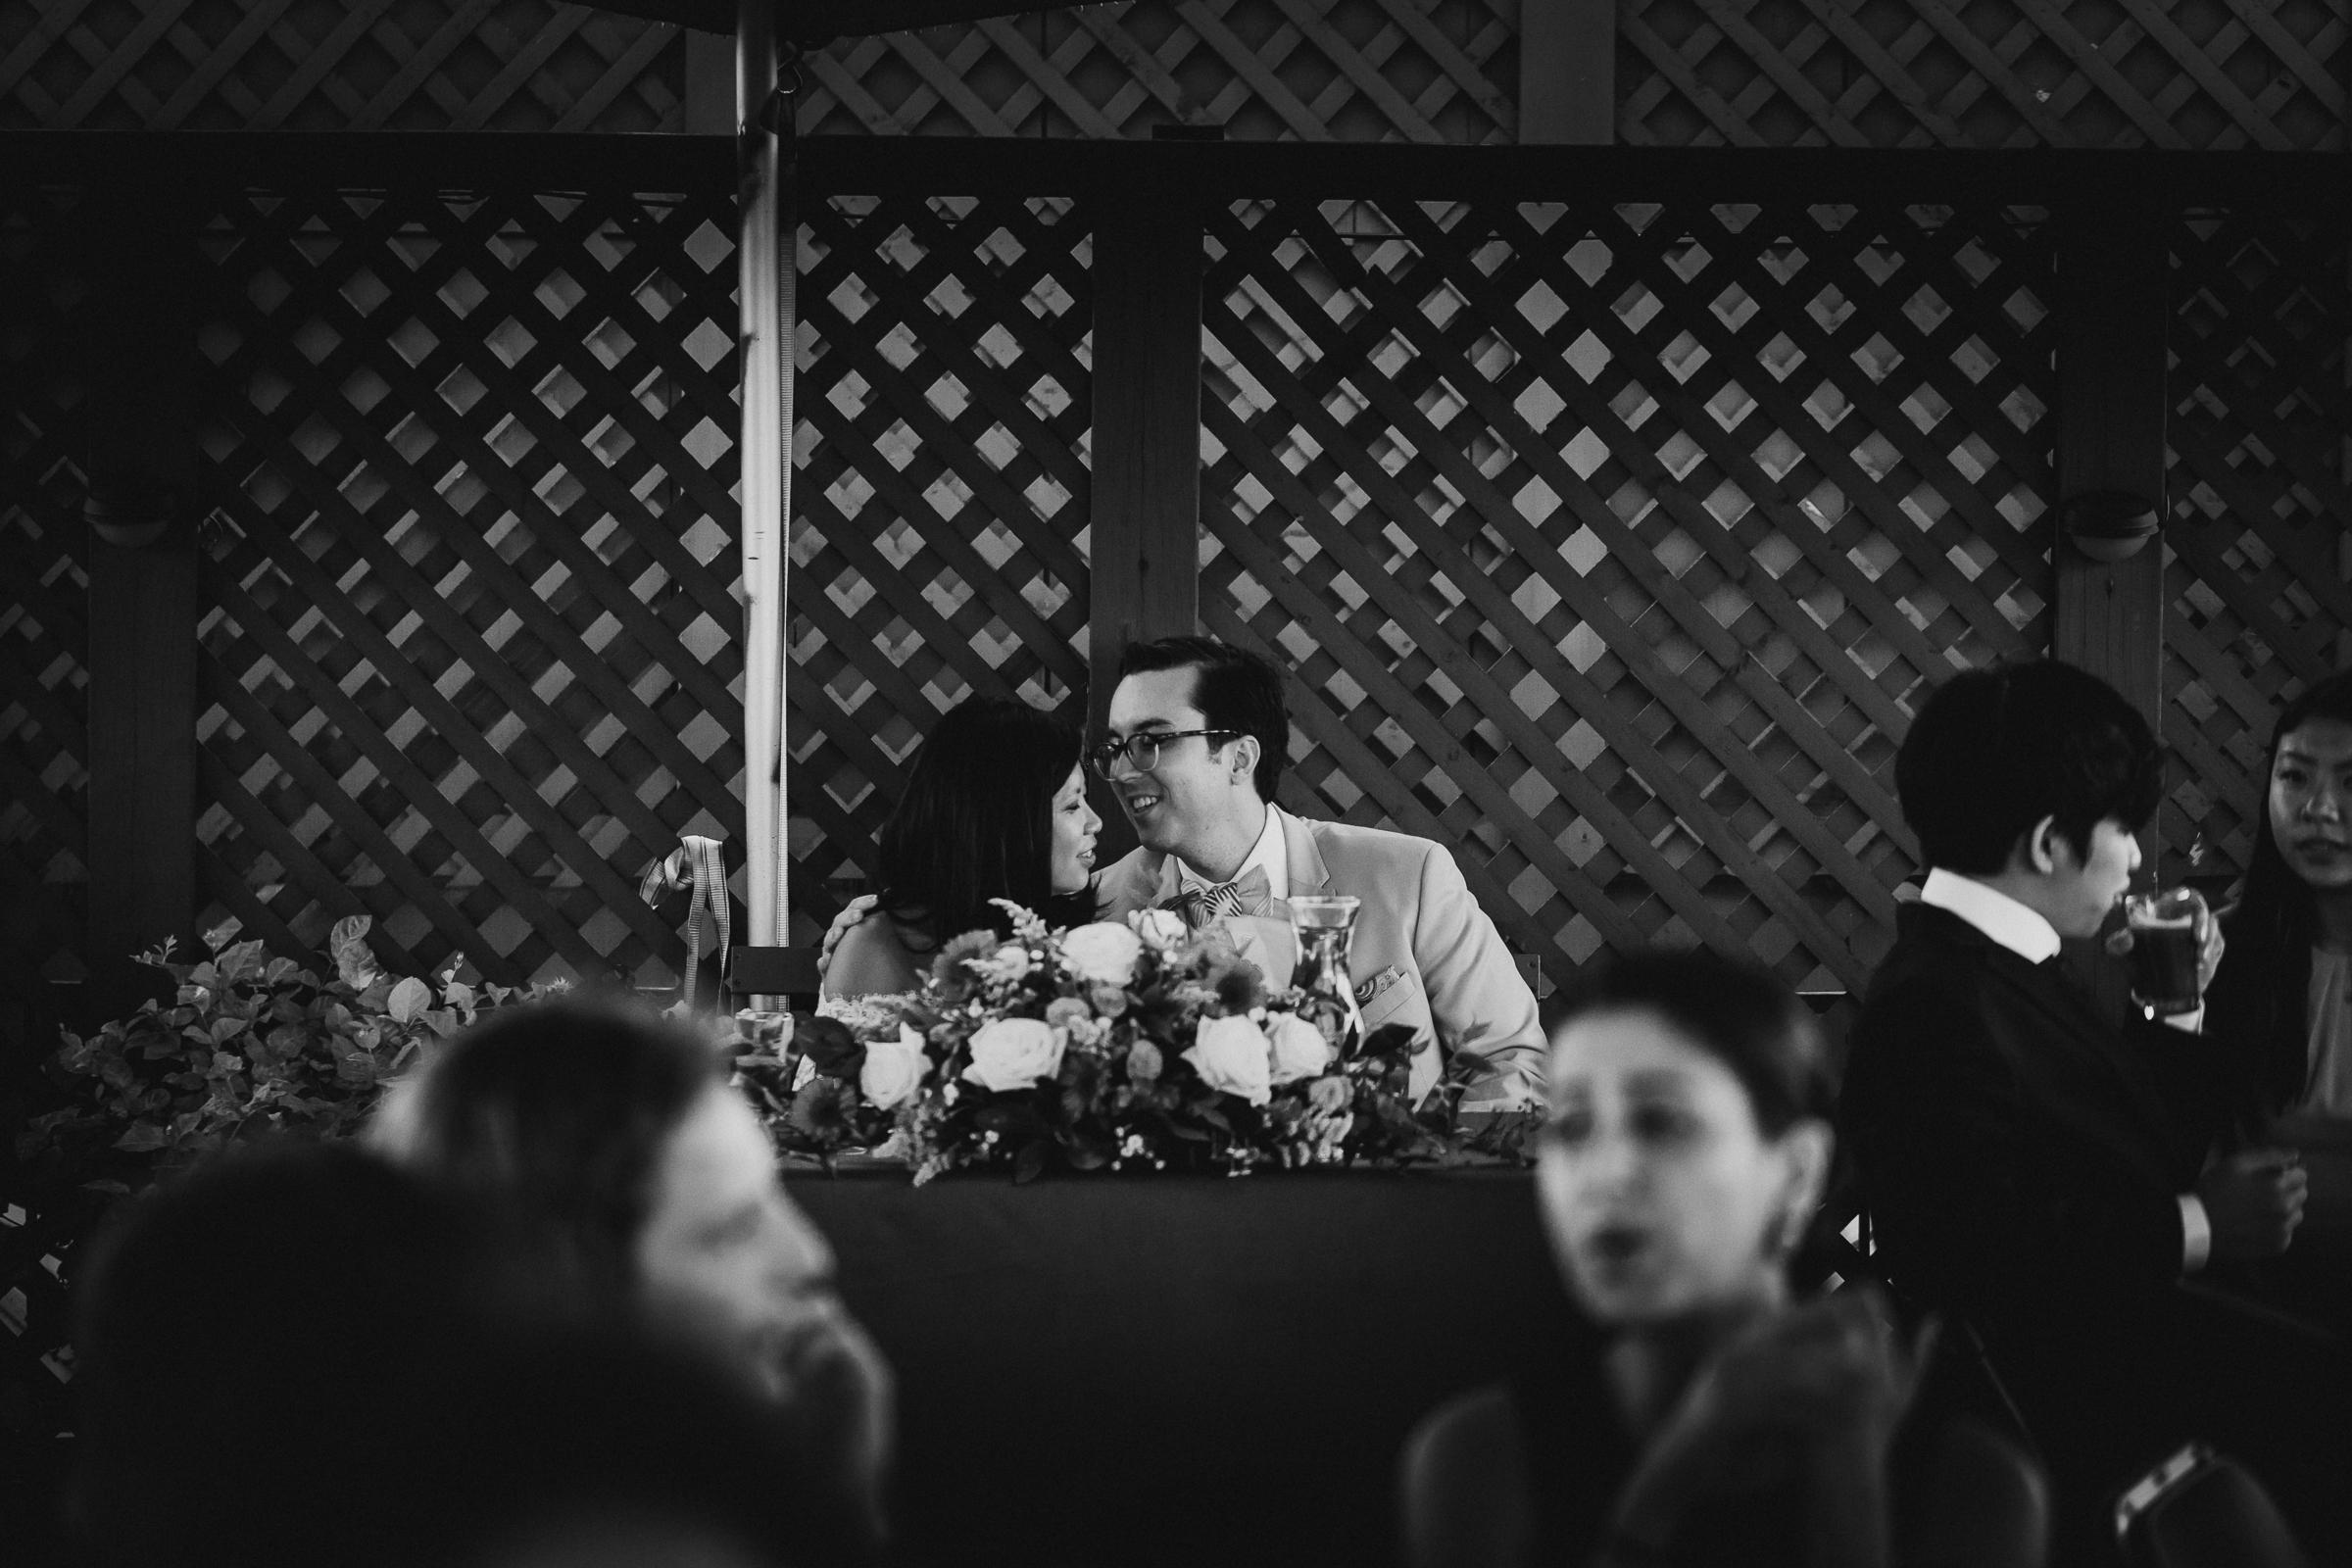 The-Bhakti-Center-Yoga-NYC-Rooftop-Documentary-Wedding-Photographer-52.jpg